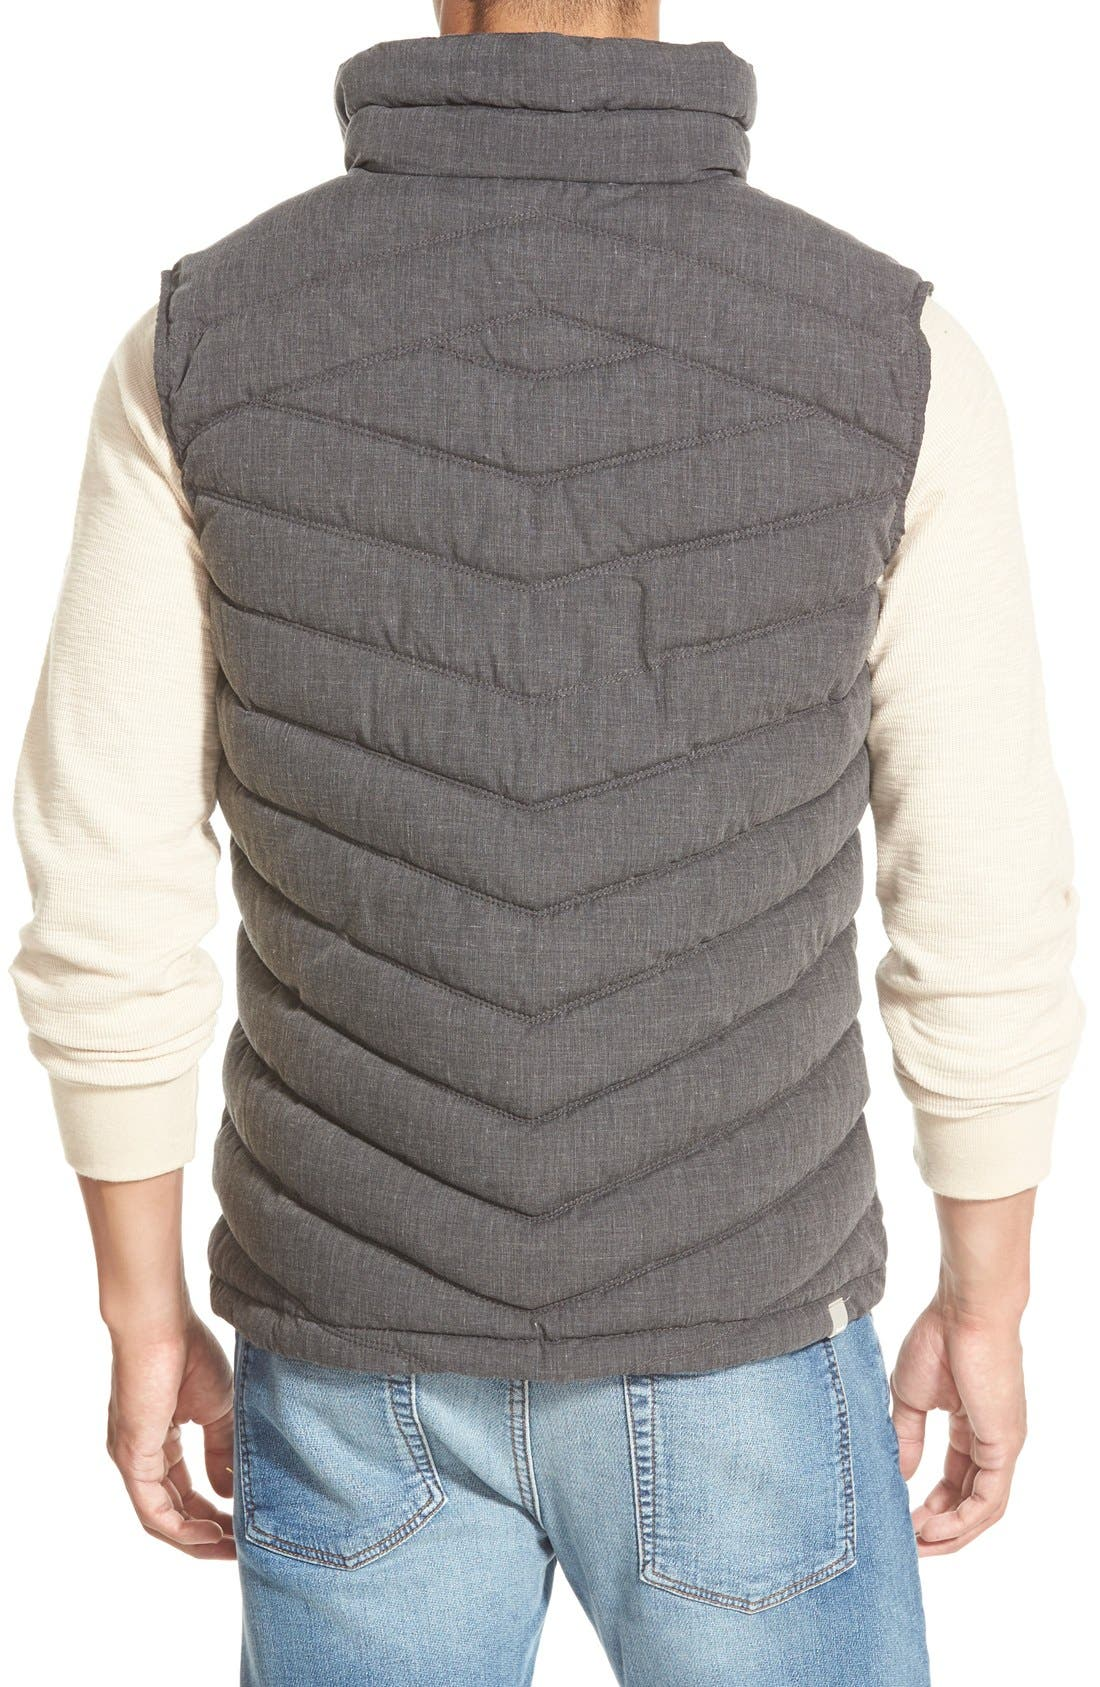 BENCH.,                             Bench Regular Fit Quilted Vest,                             Alternate thumbnail 4, color,                             001